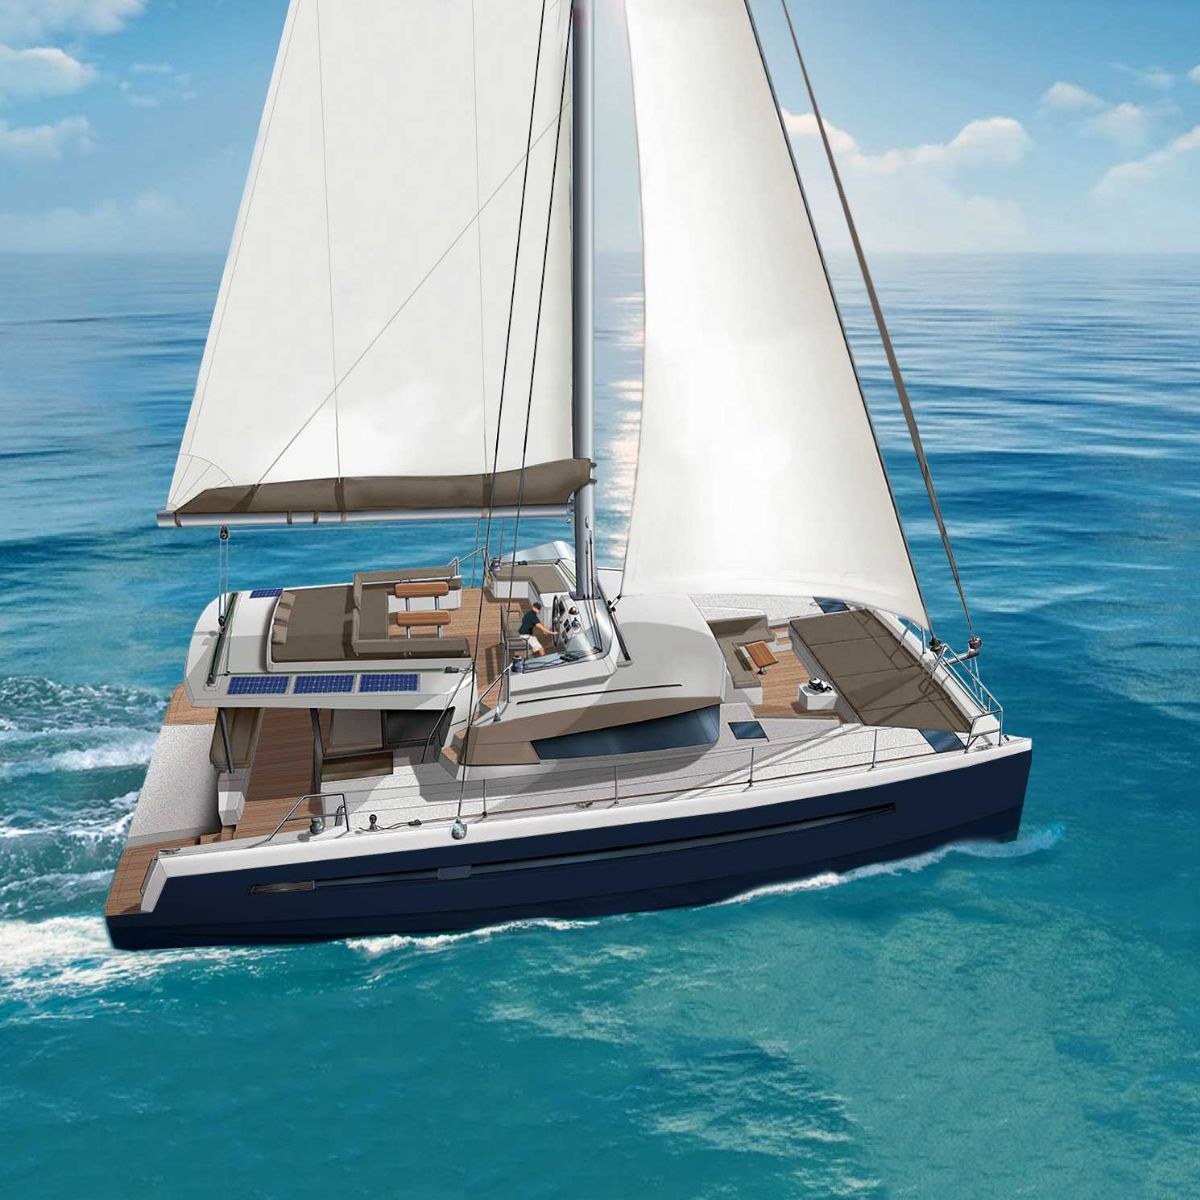 New Greece Catamaran Charter New Horizons 3 Ckim Group